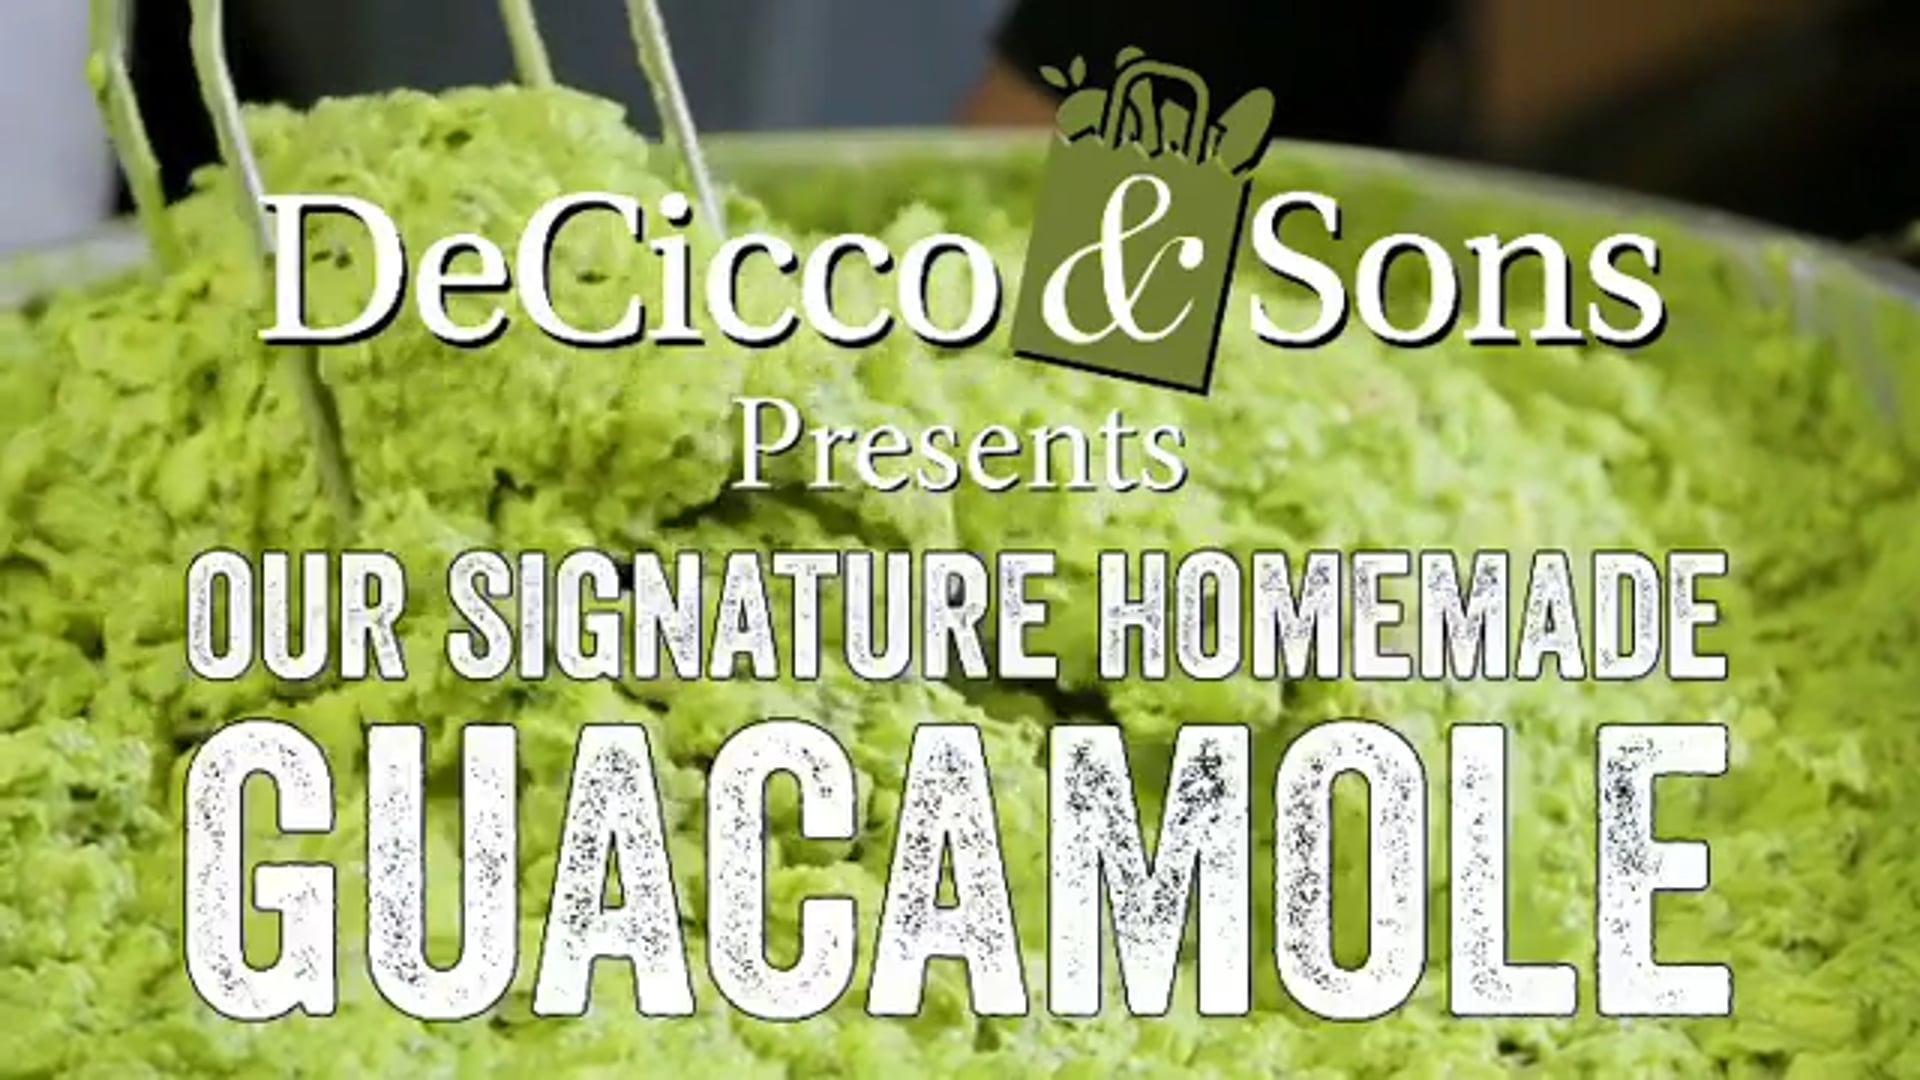 Advertising - Guacomole for Deciccos